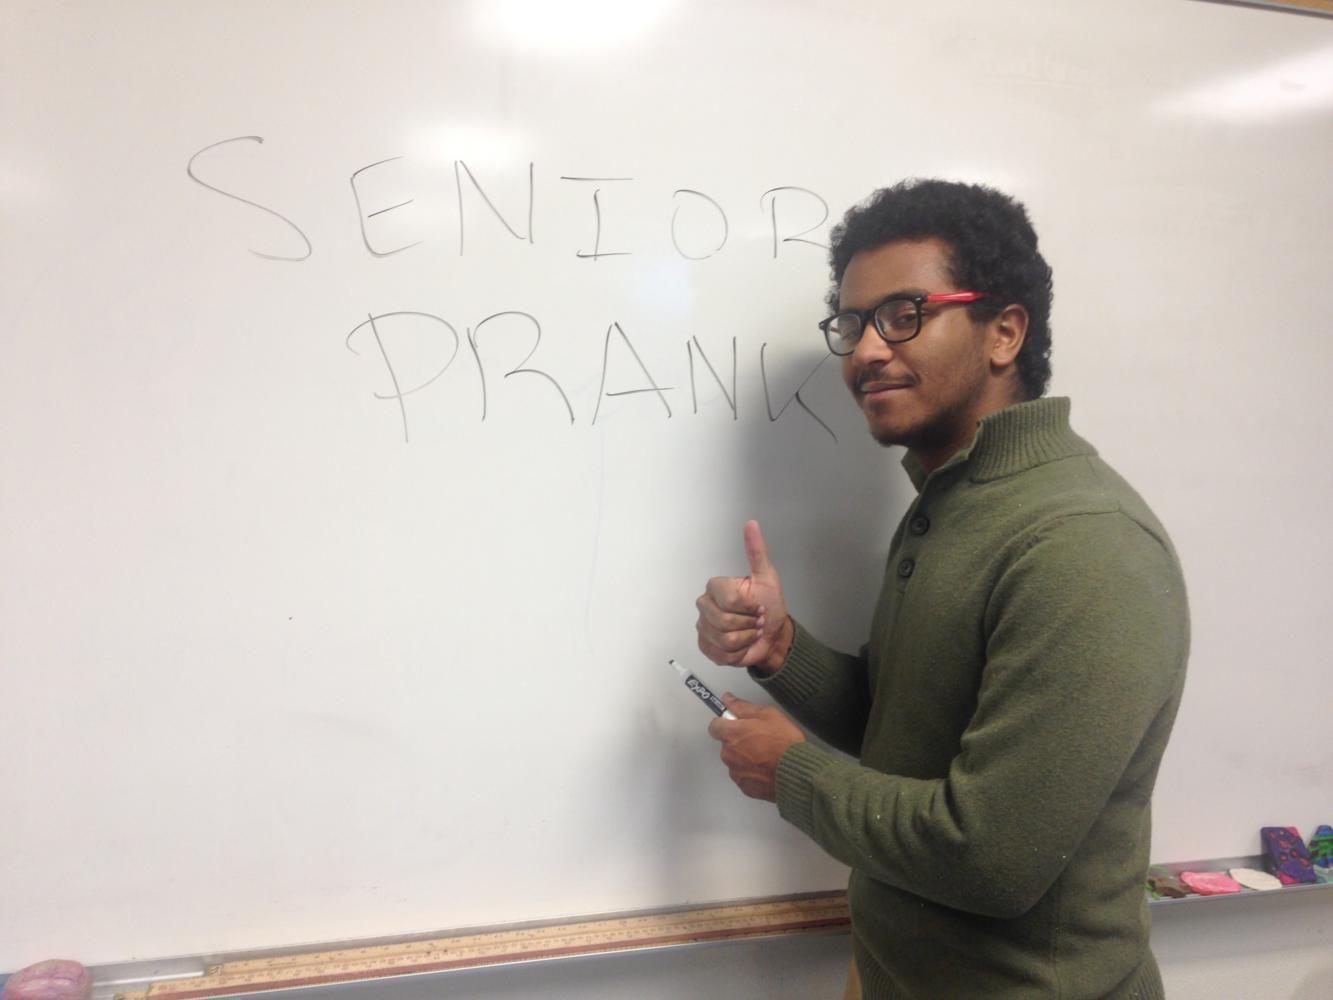 The Perfect Senior Prank